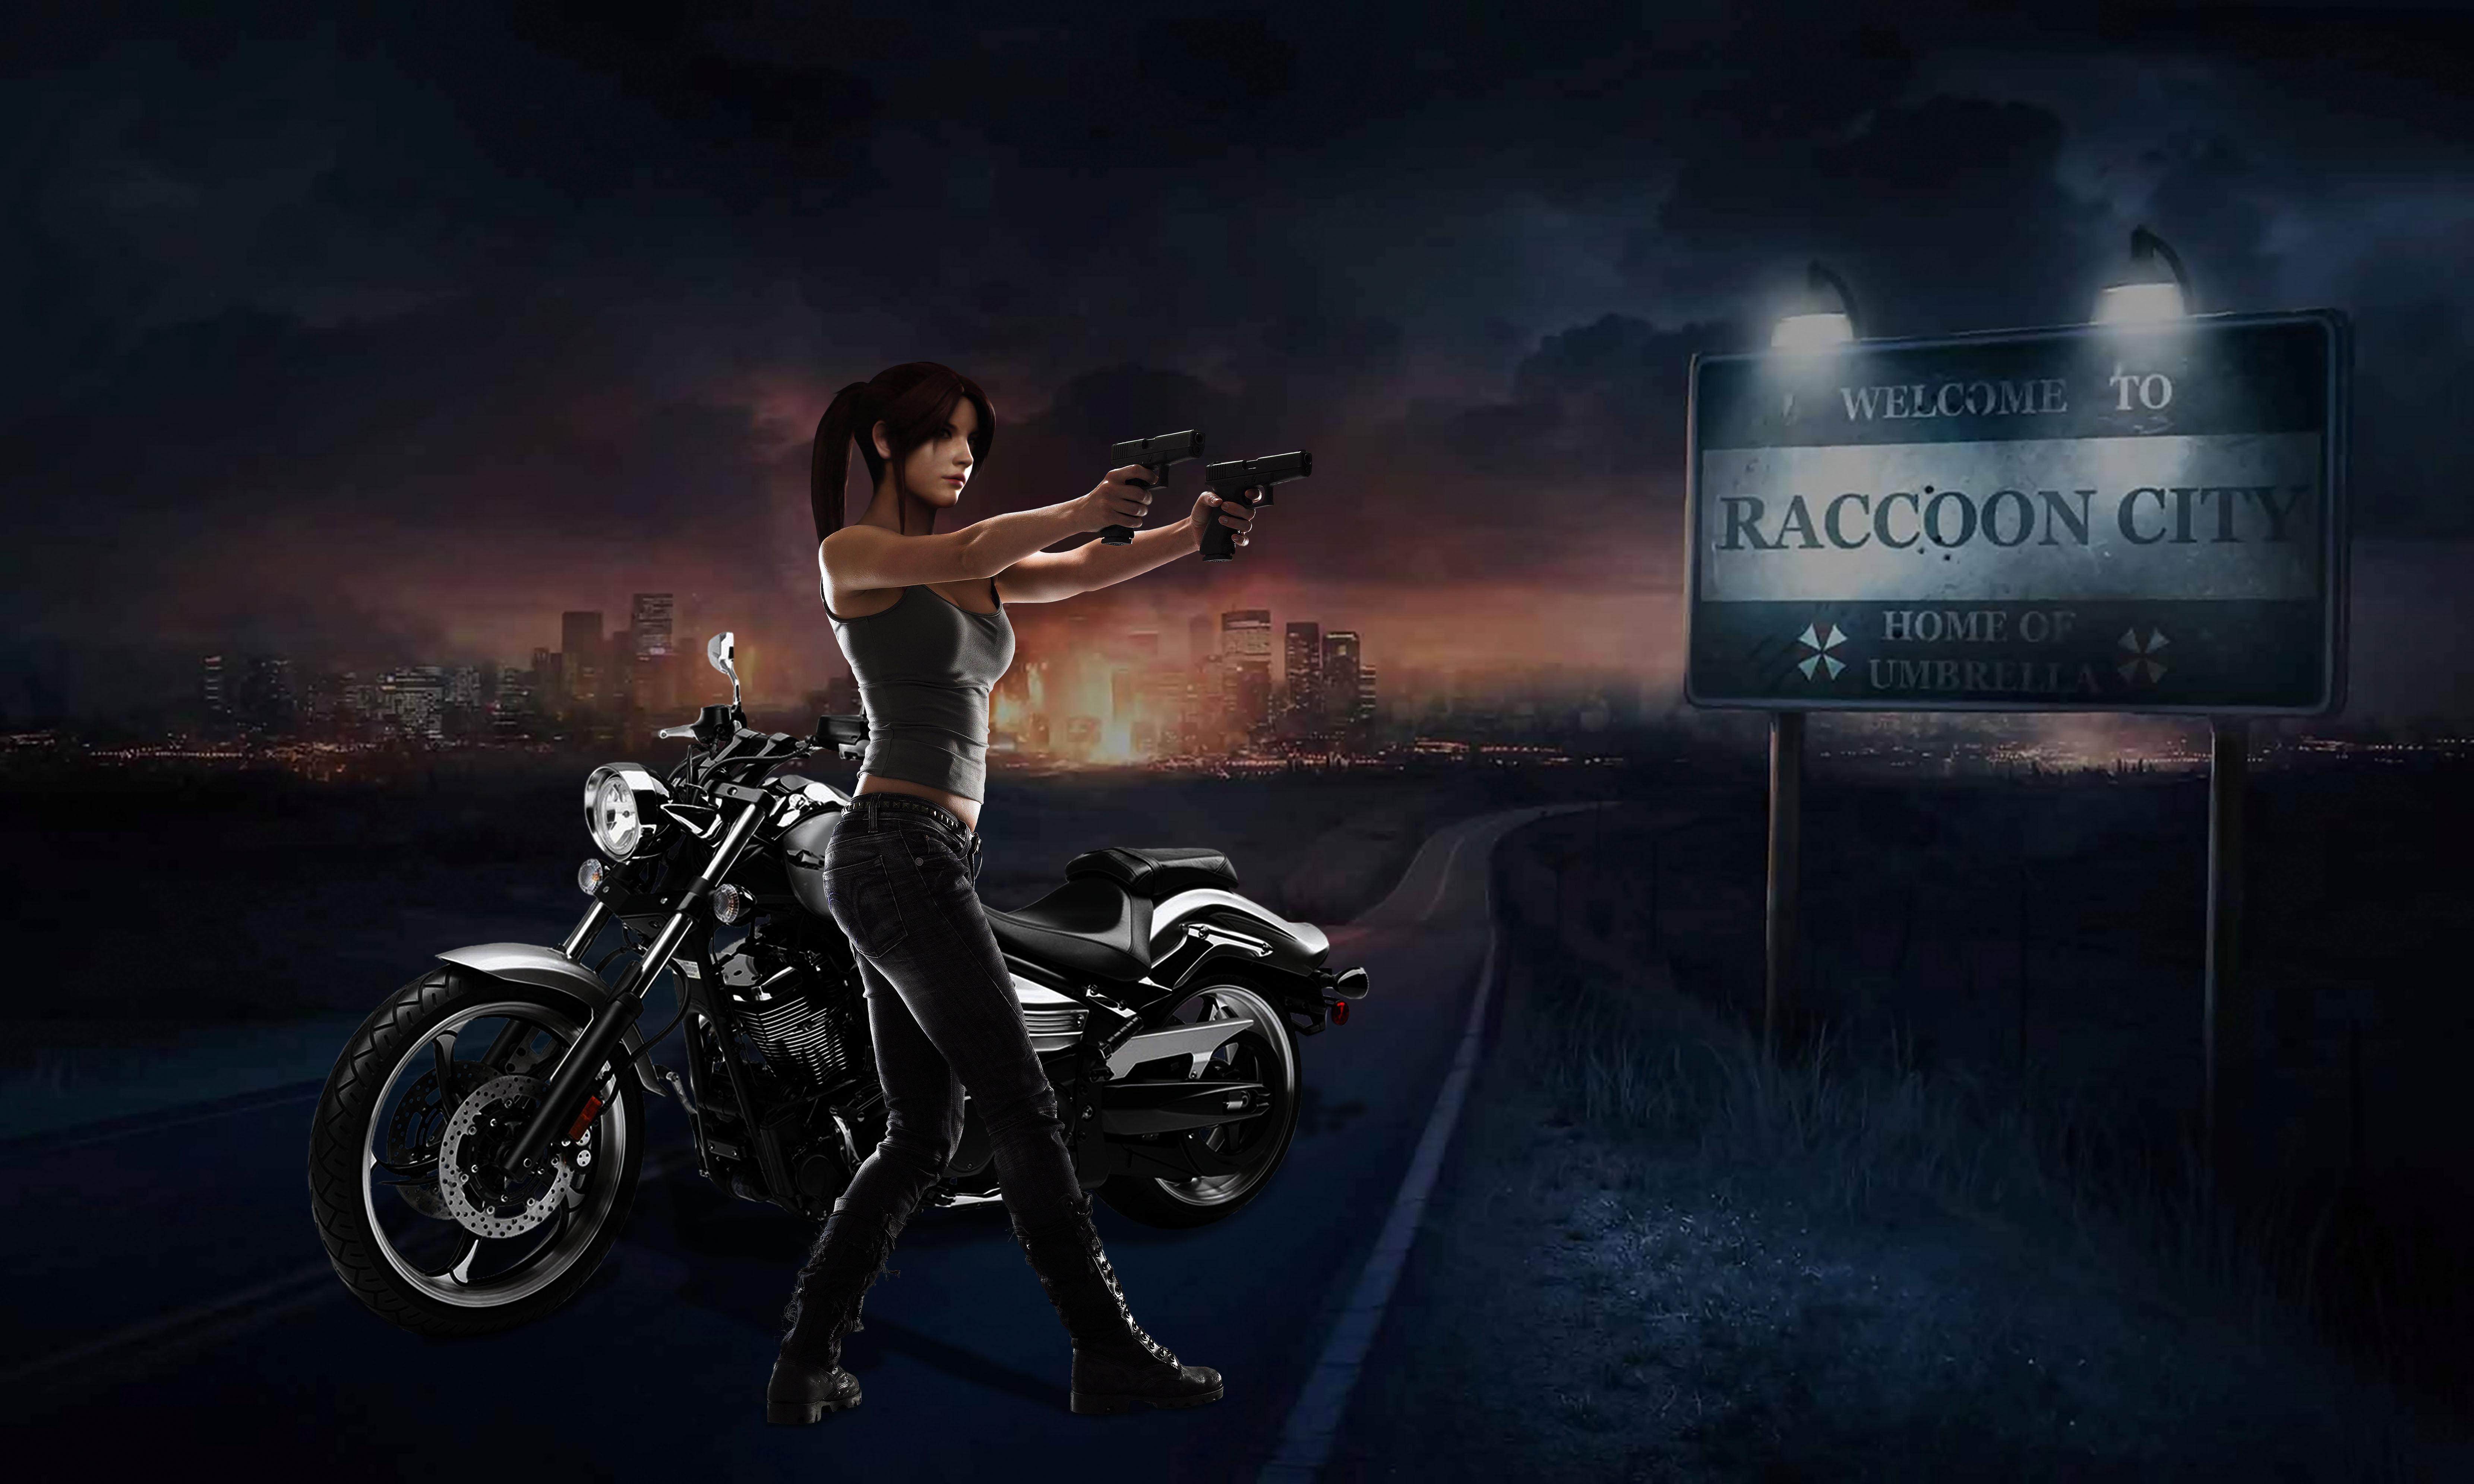 Survivor of Raccoon City by Taitiii